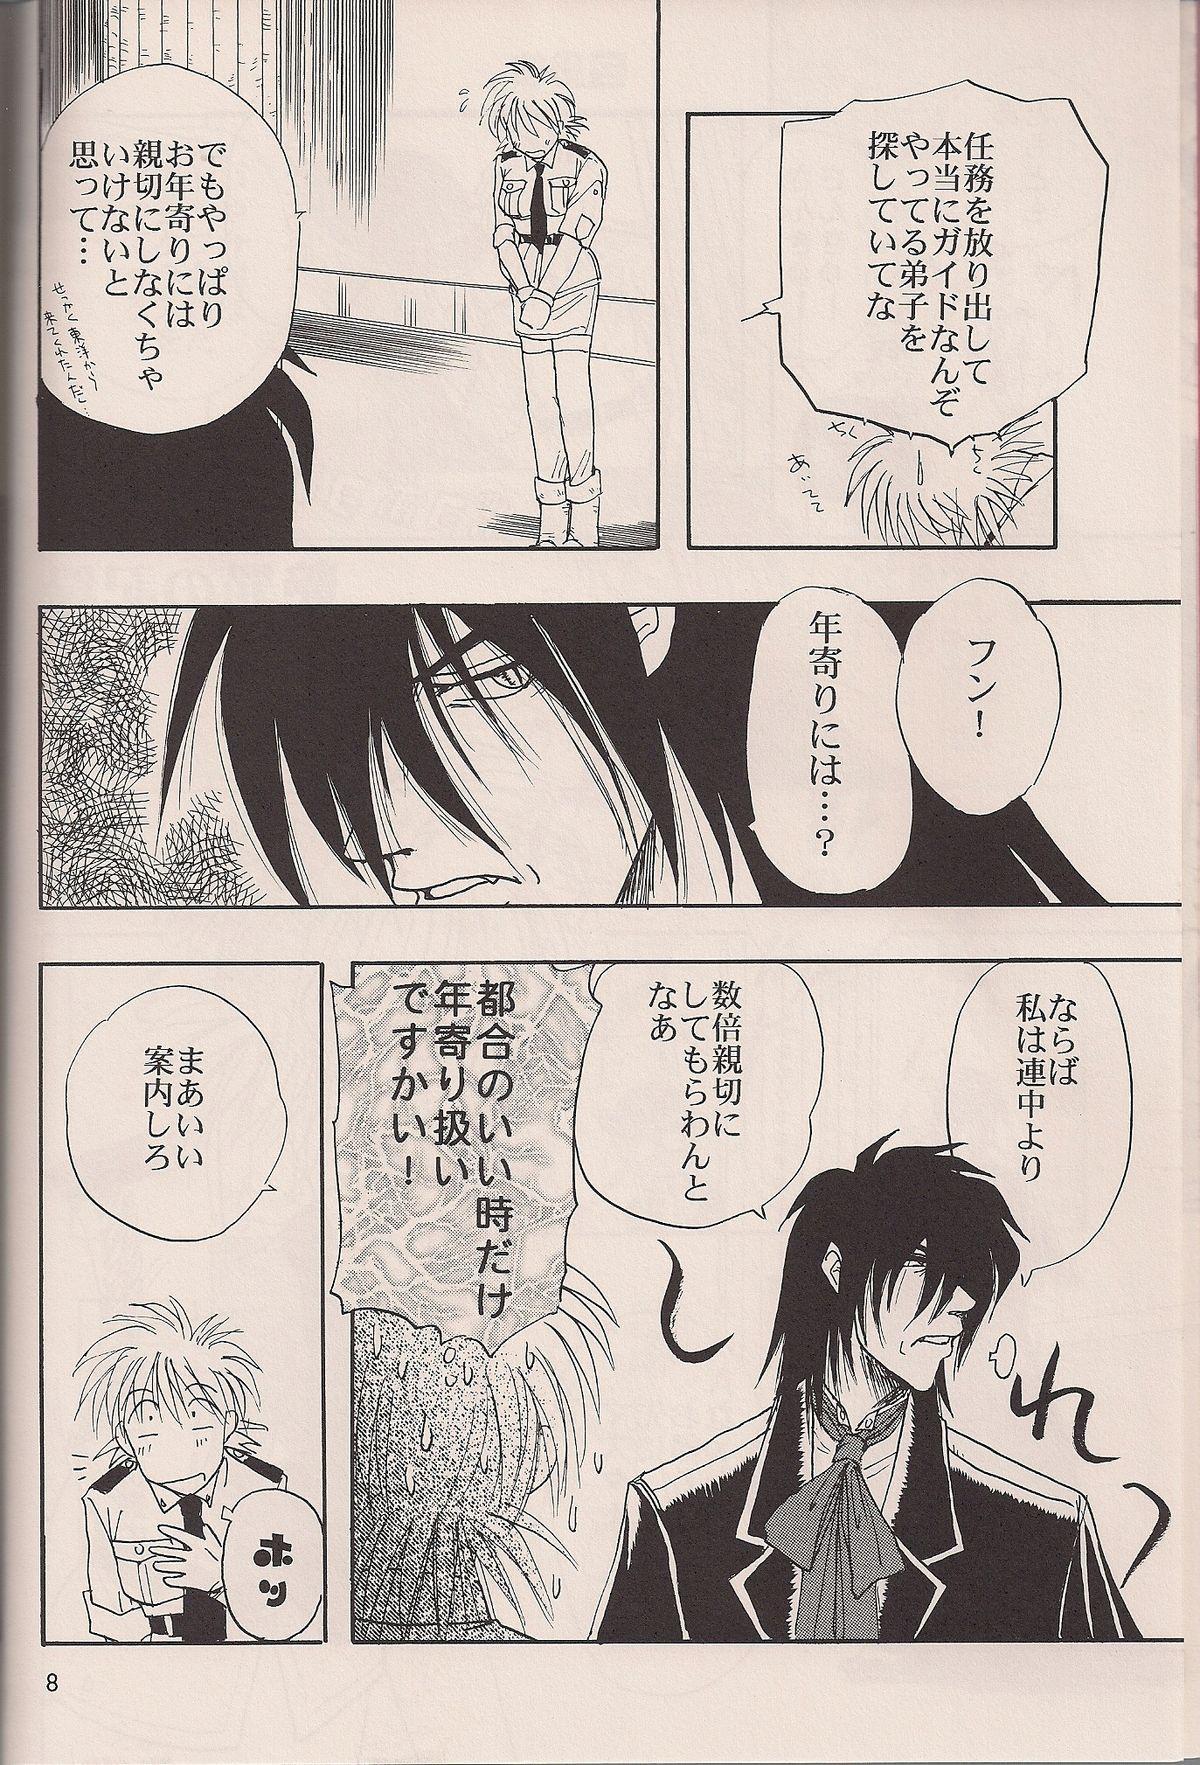 Enzai no Kiroku 6